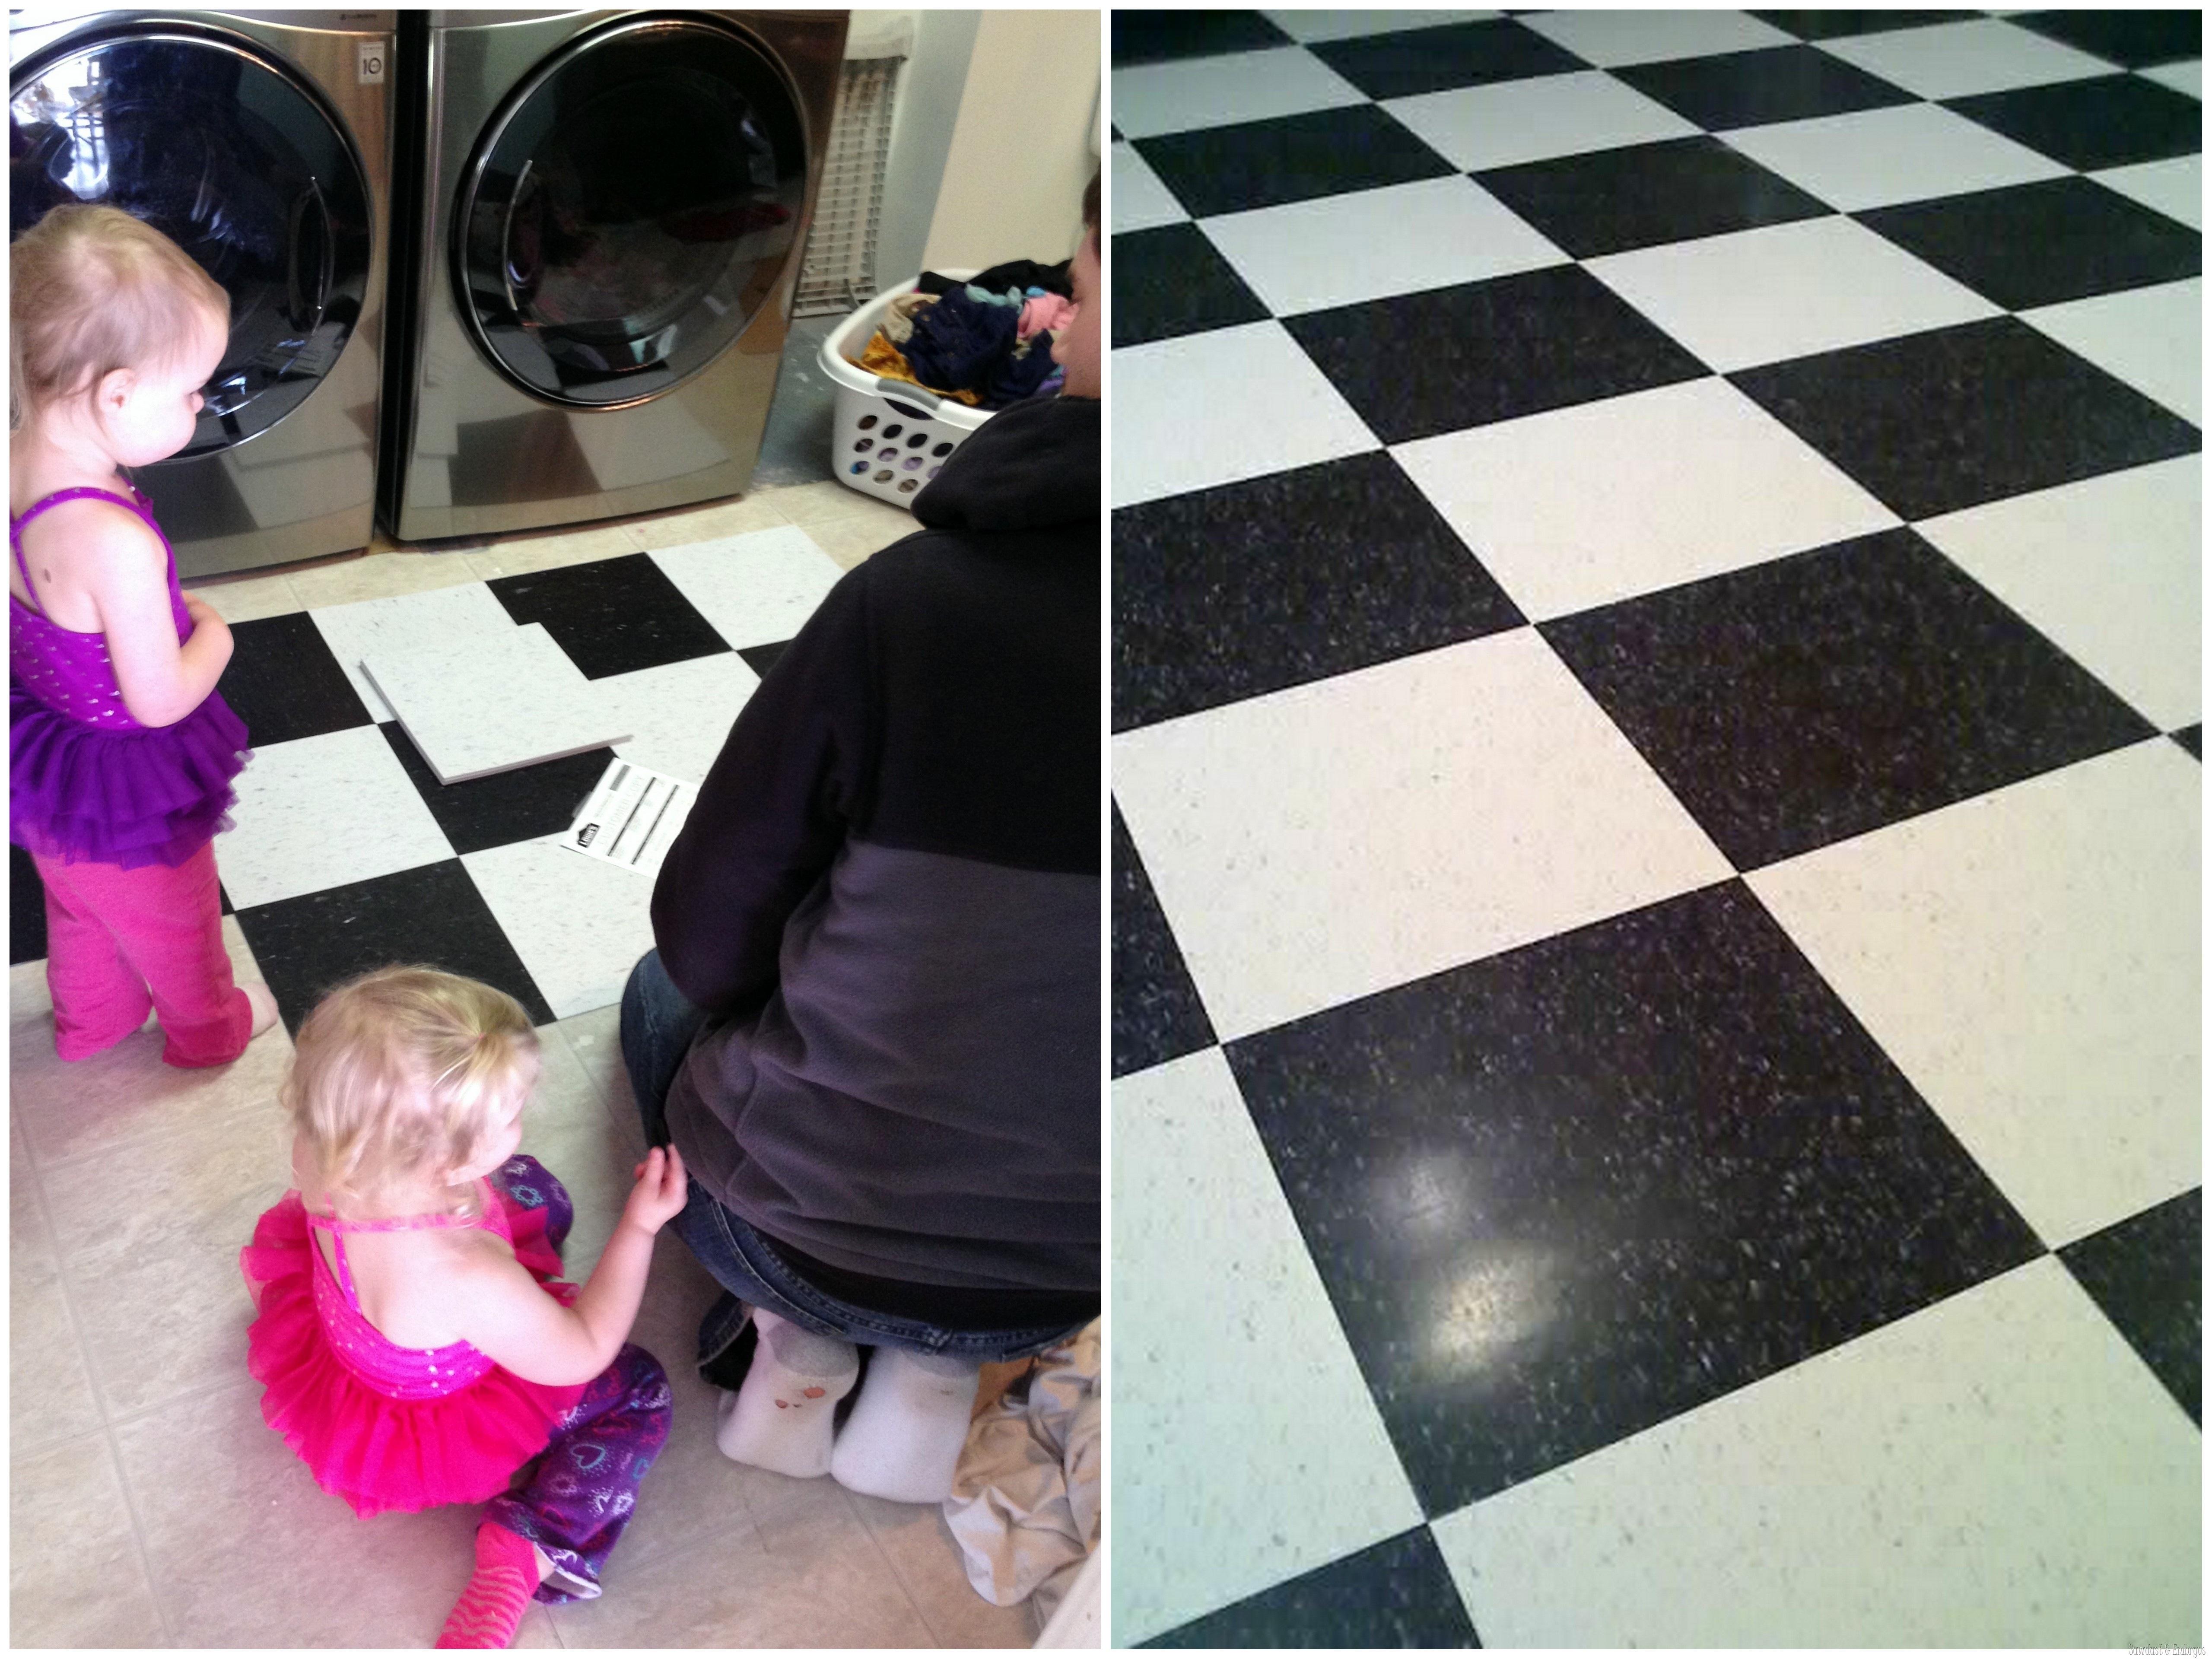 Operation Laundry Room Flooring Toilet Reality Daydream